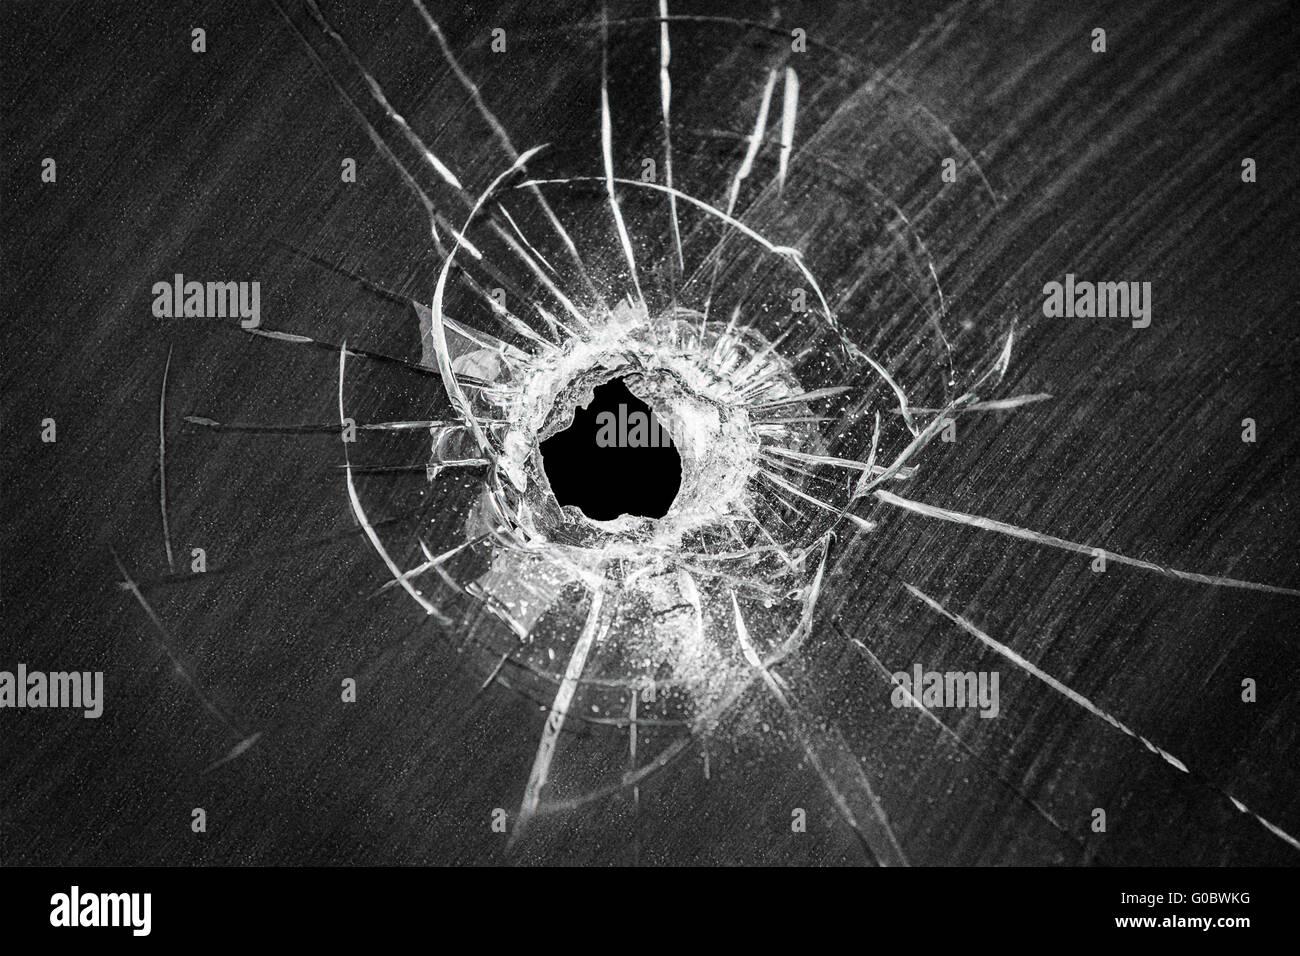 Bullet shot cracked hole on broken window glass - Stock Image